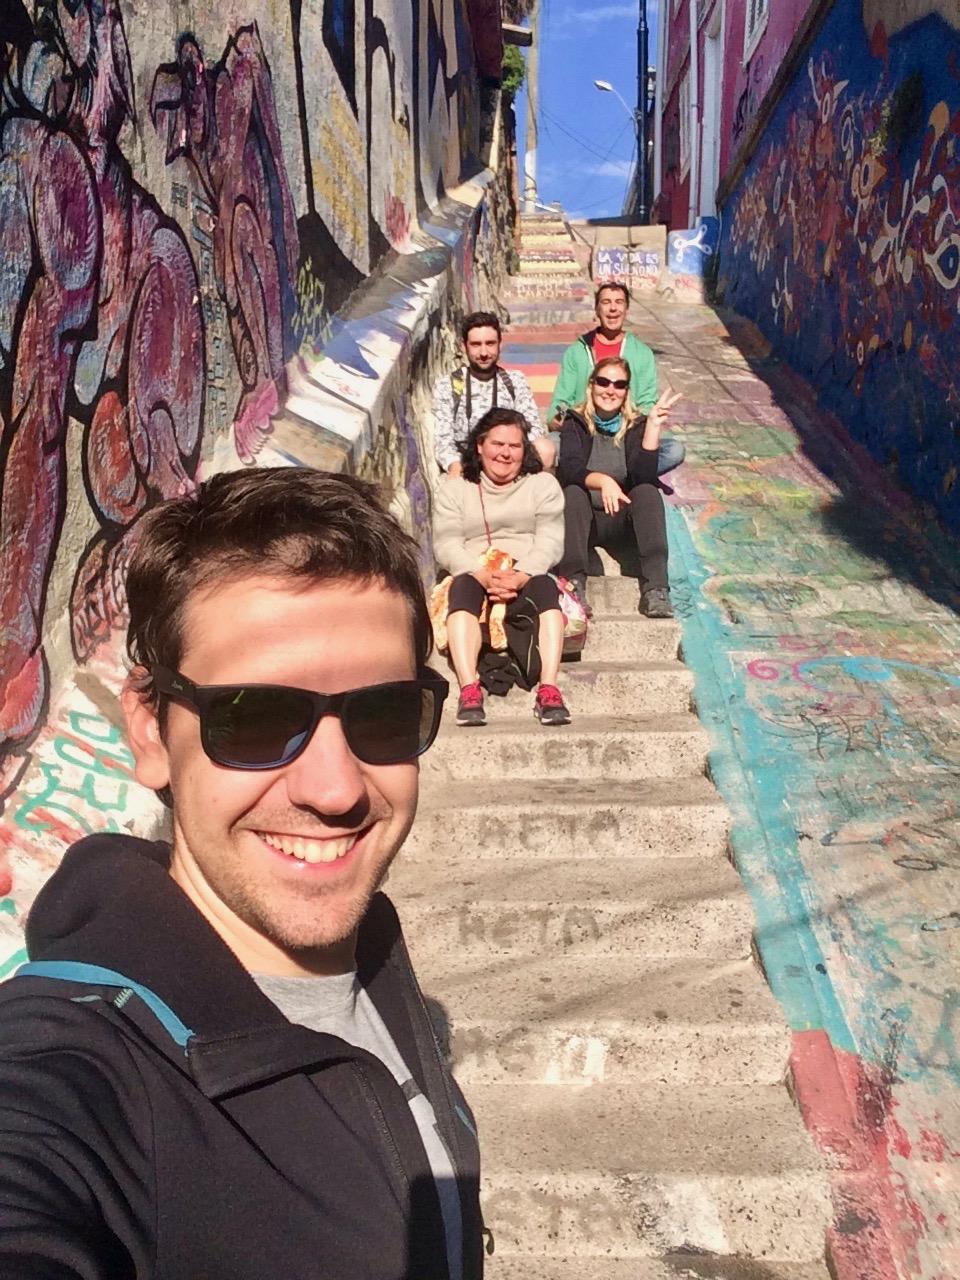 Escalier famille Valparaiso Chili